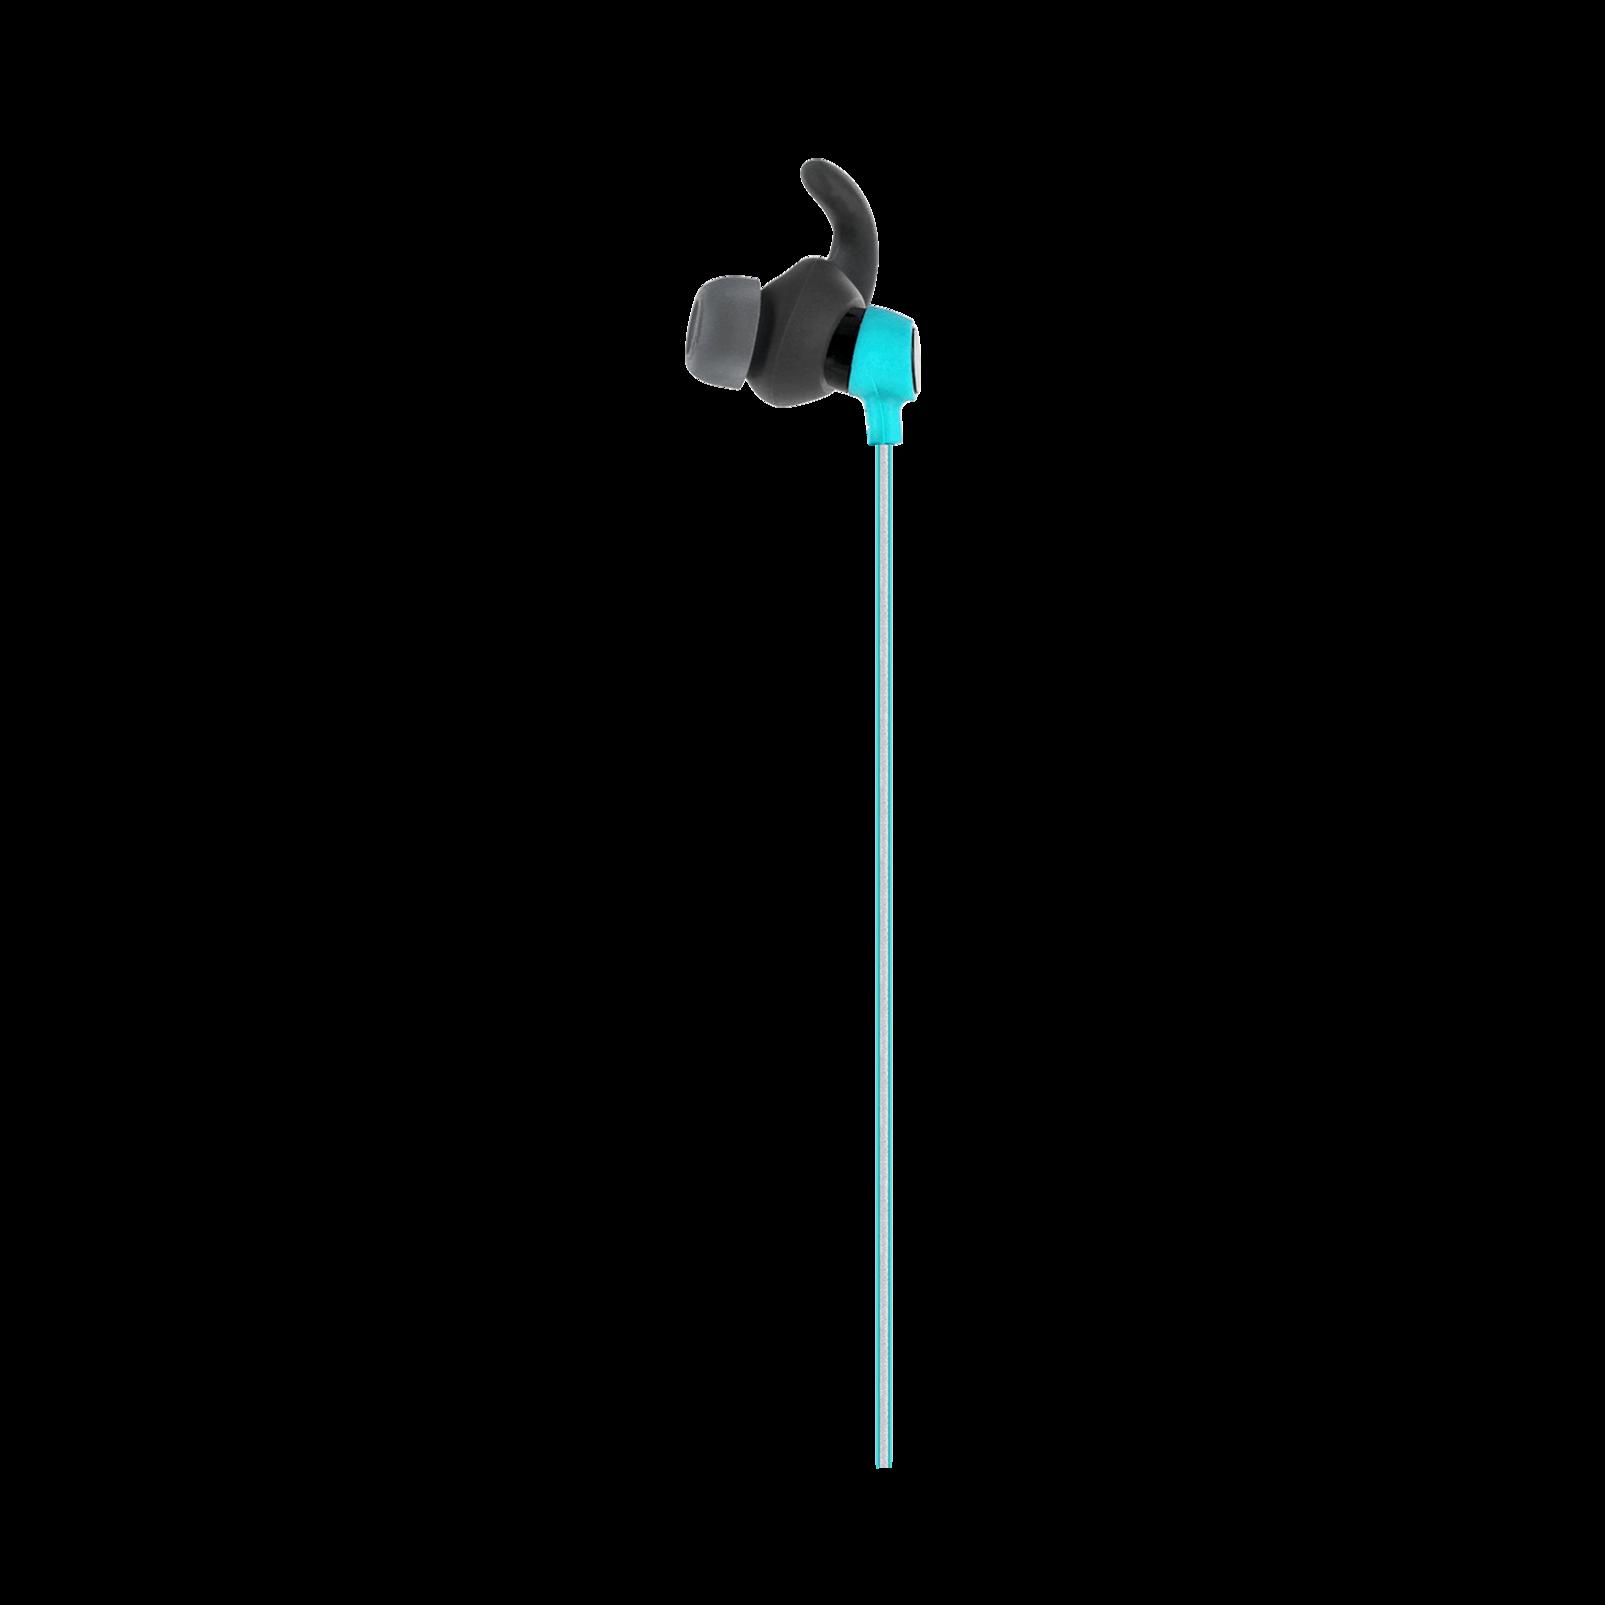 Reflect Mini - Teal - Lightweight, in-ear sport headphones - Detailshot 5